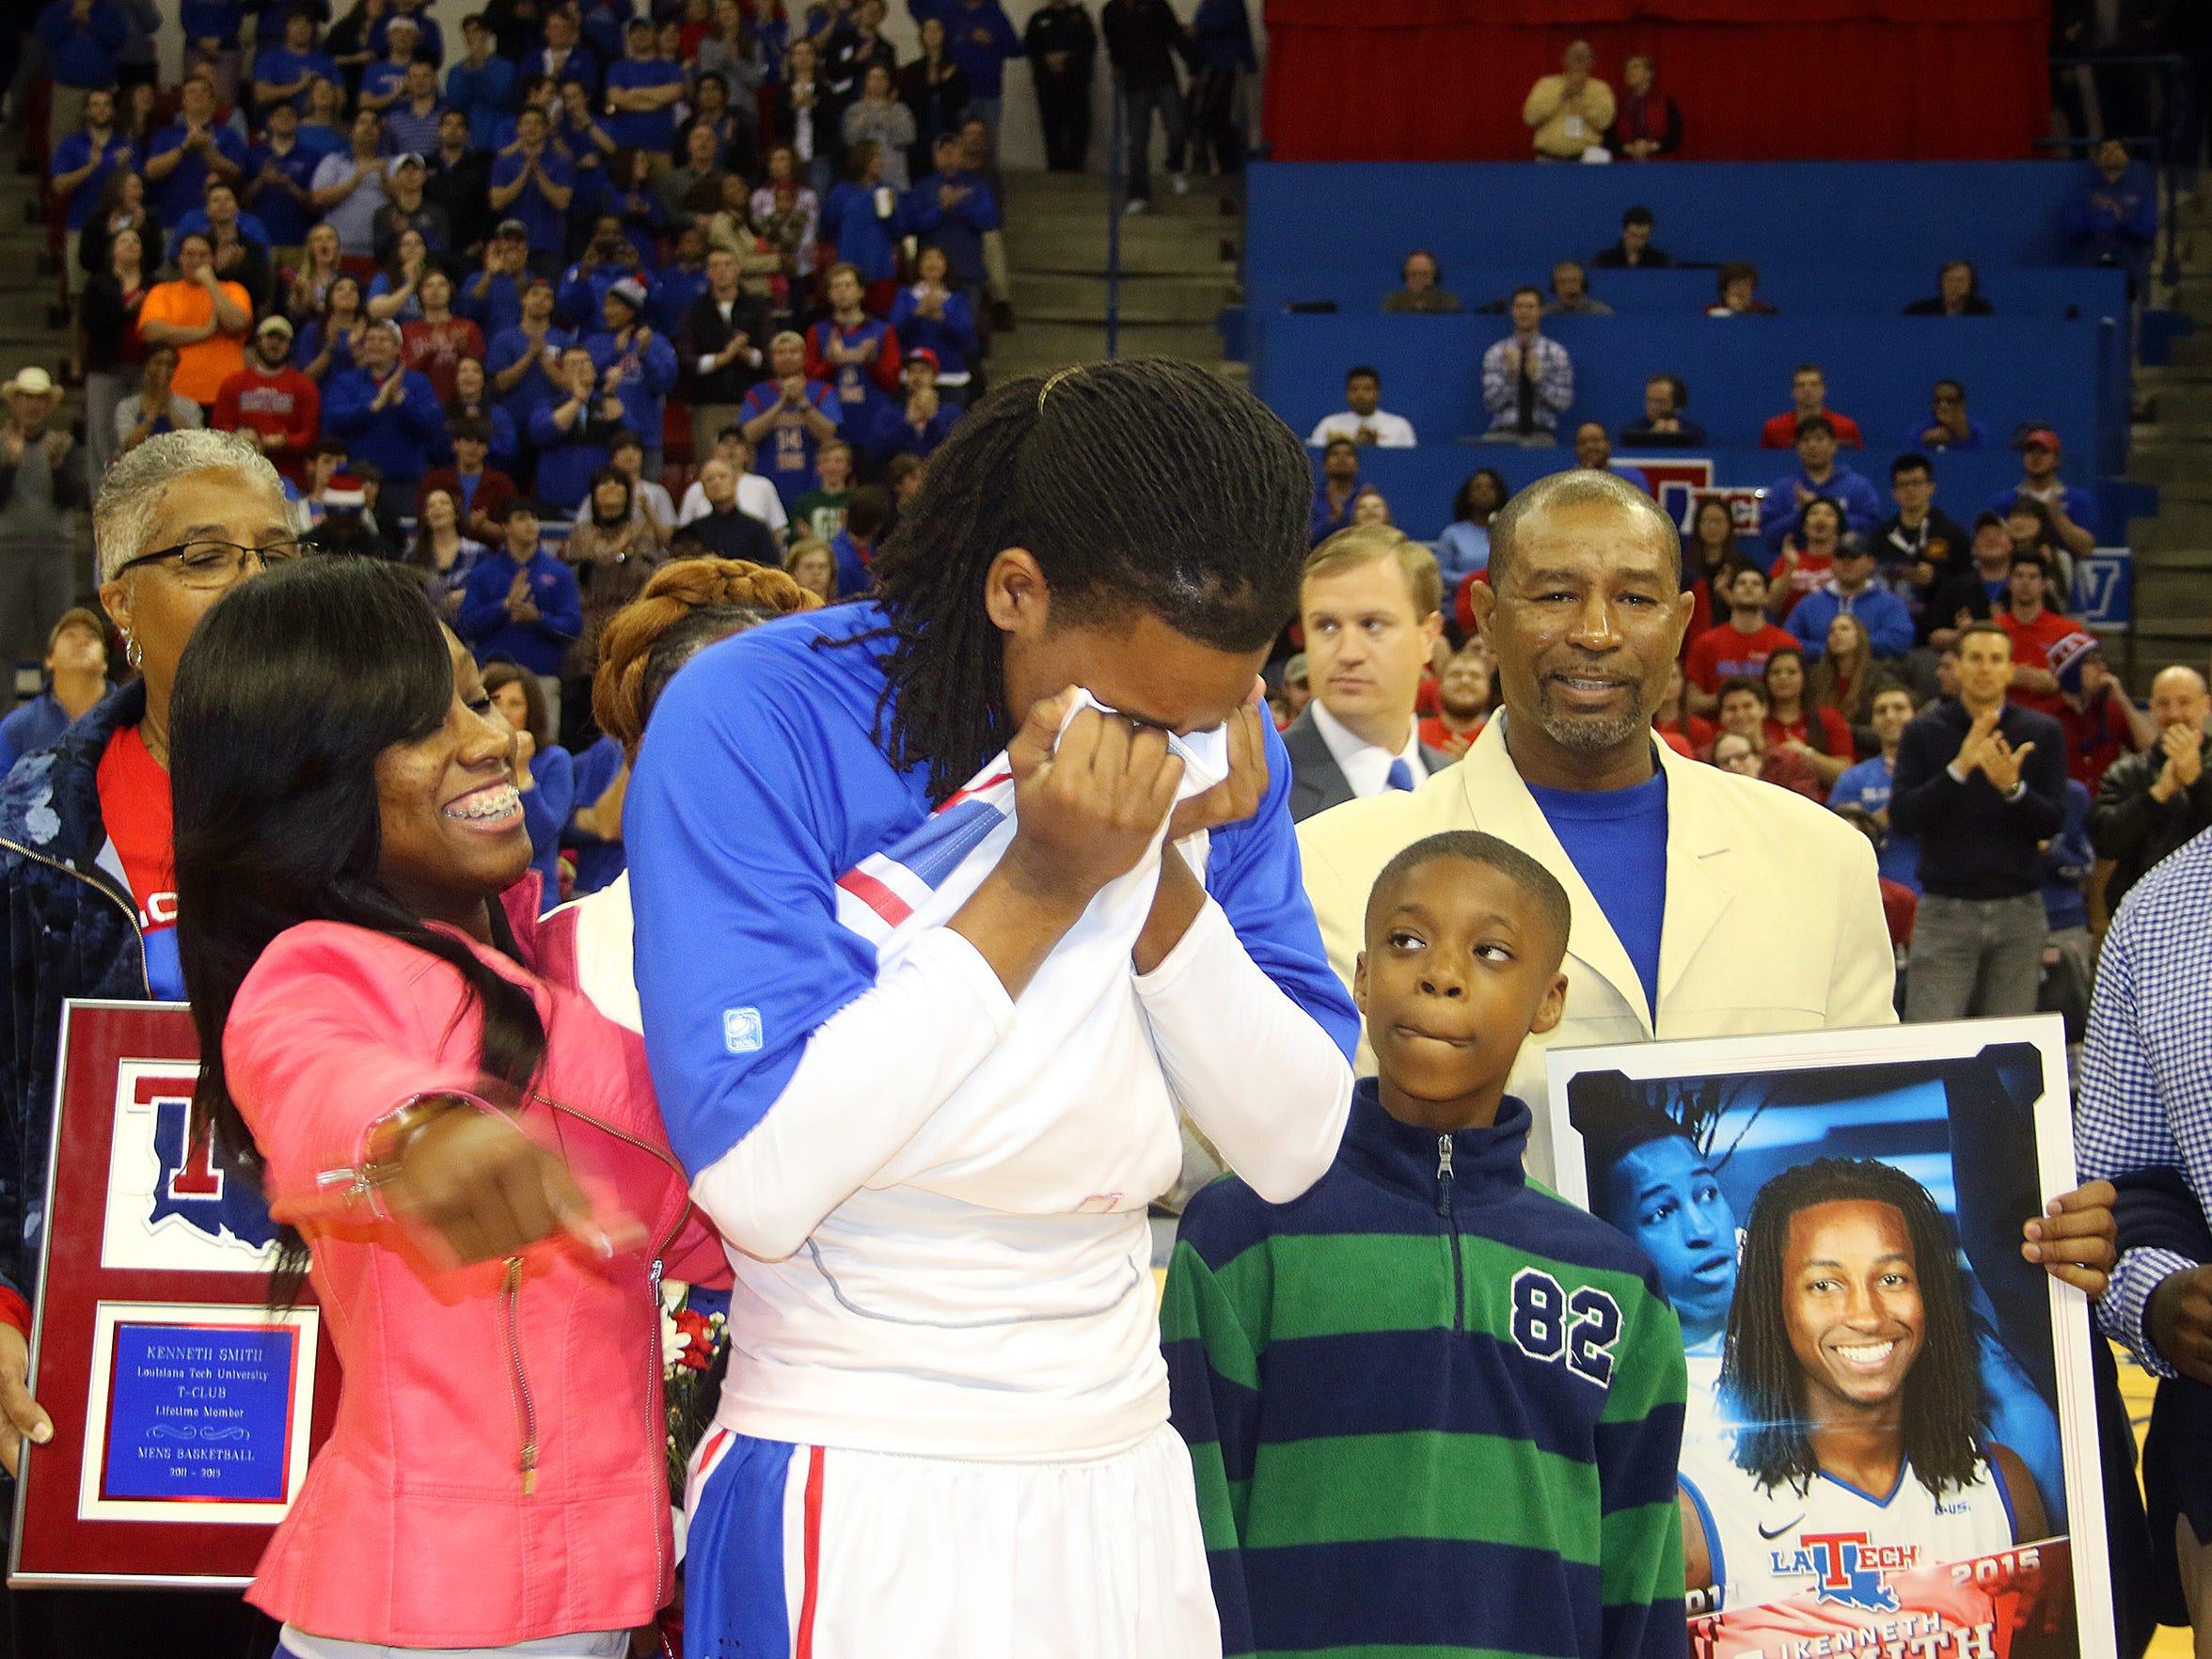 Louisiana Tech senior guard Speedy Smith gets emotional